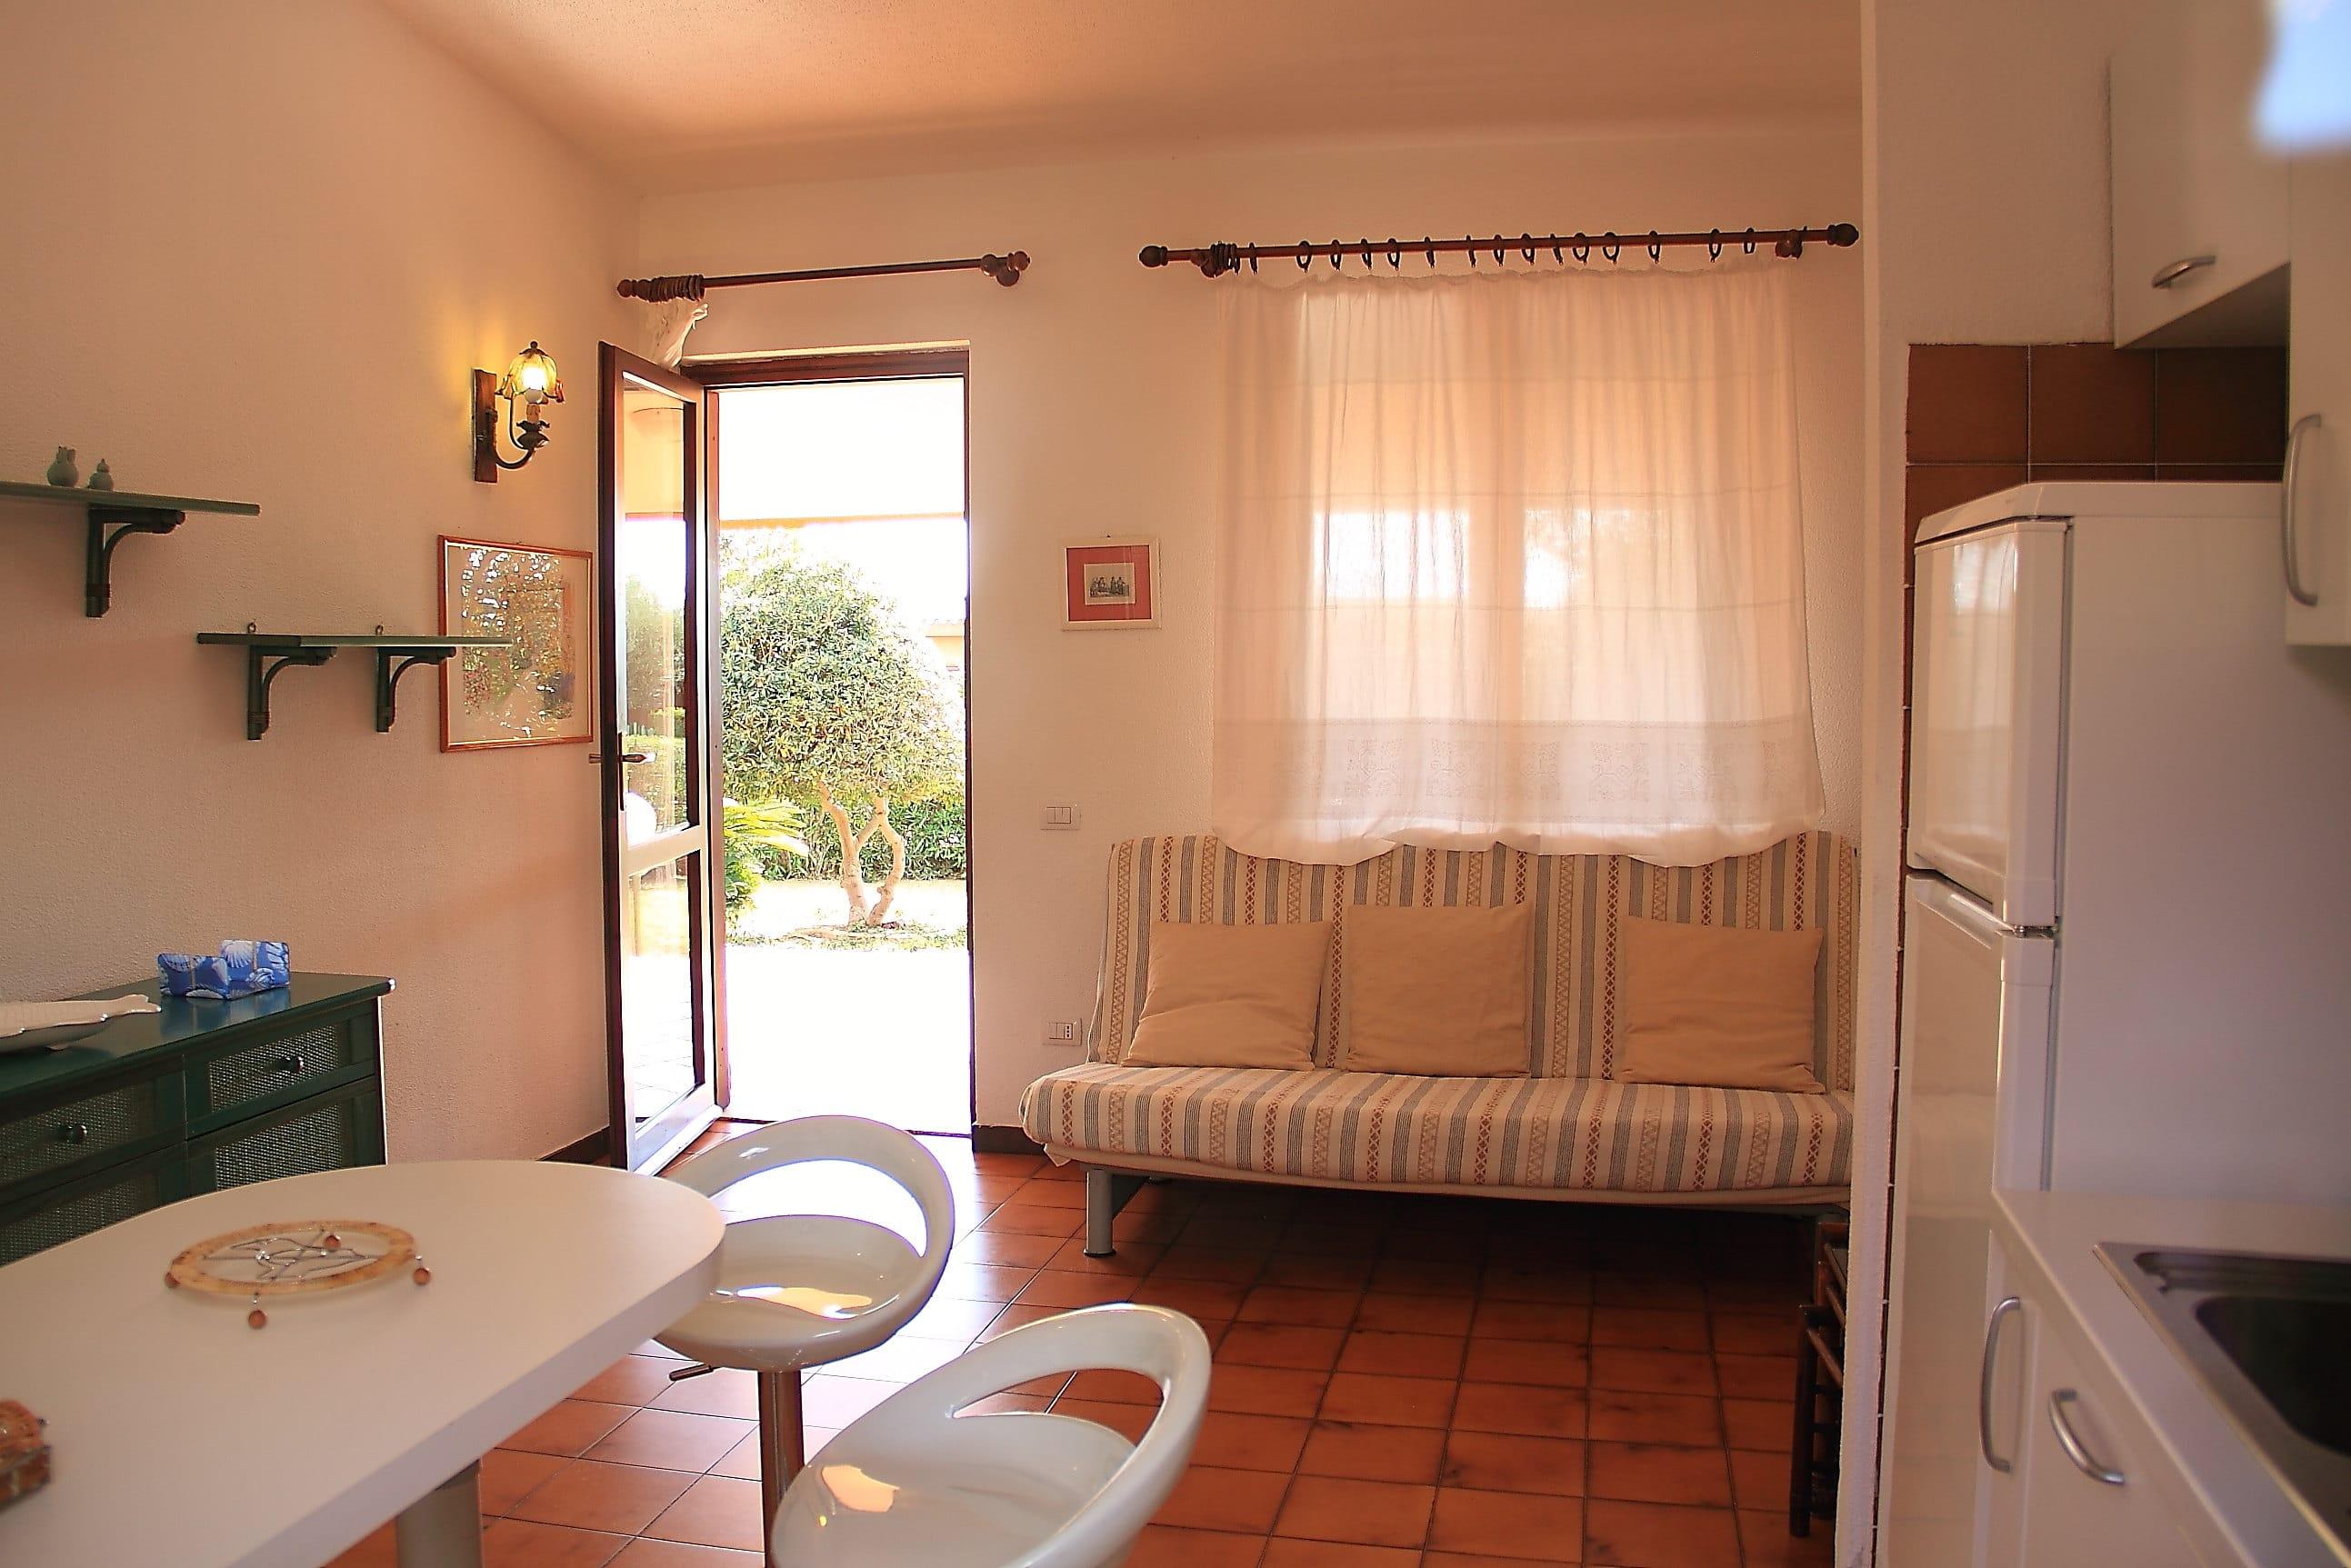 Garten villa 3 room superior piscina rei - Piscina rei village ...